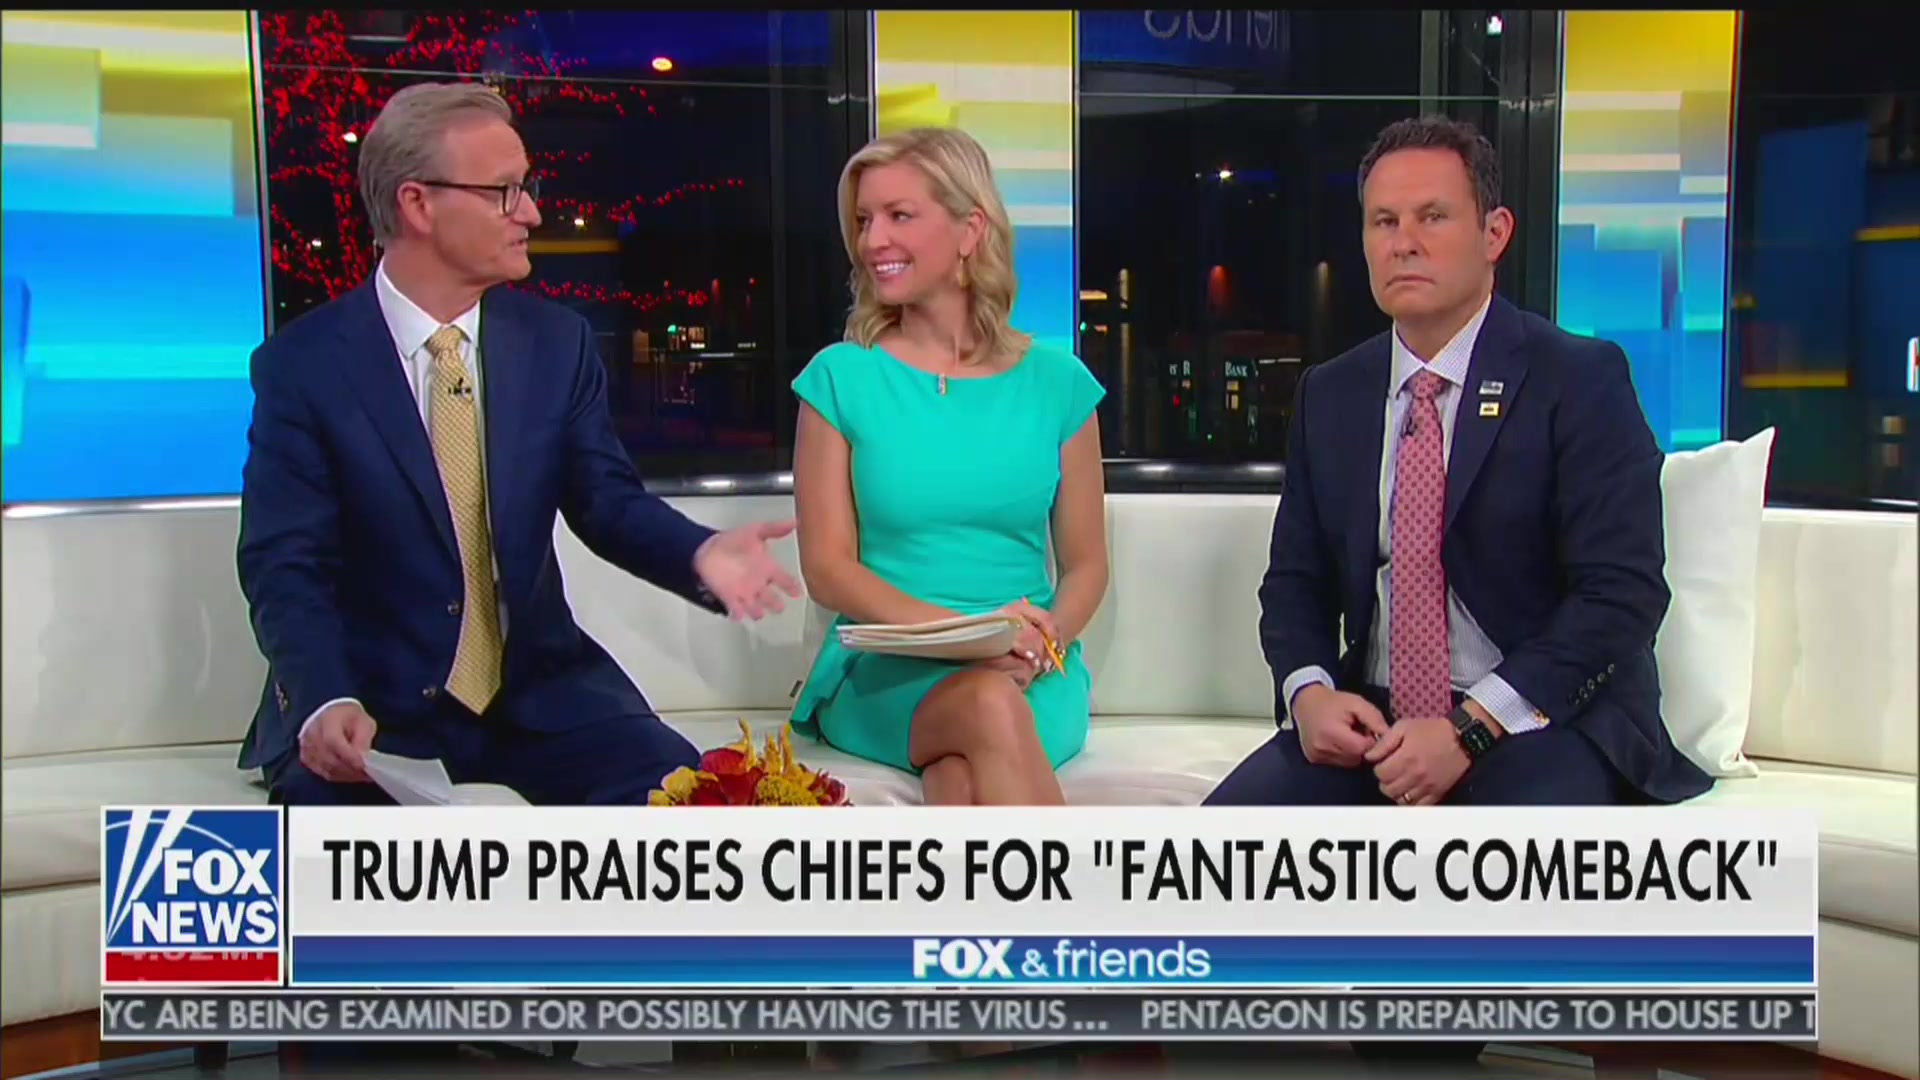 'Fox & Friends' Defends Trump's Super Bowl Tweet: 'Kansas City Is in Kansas'